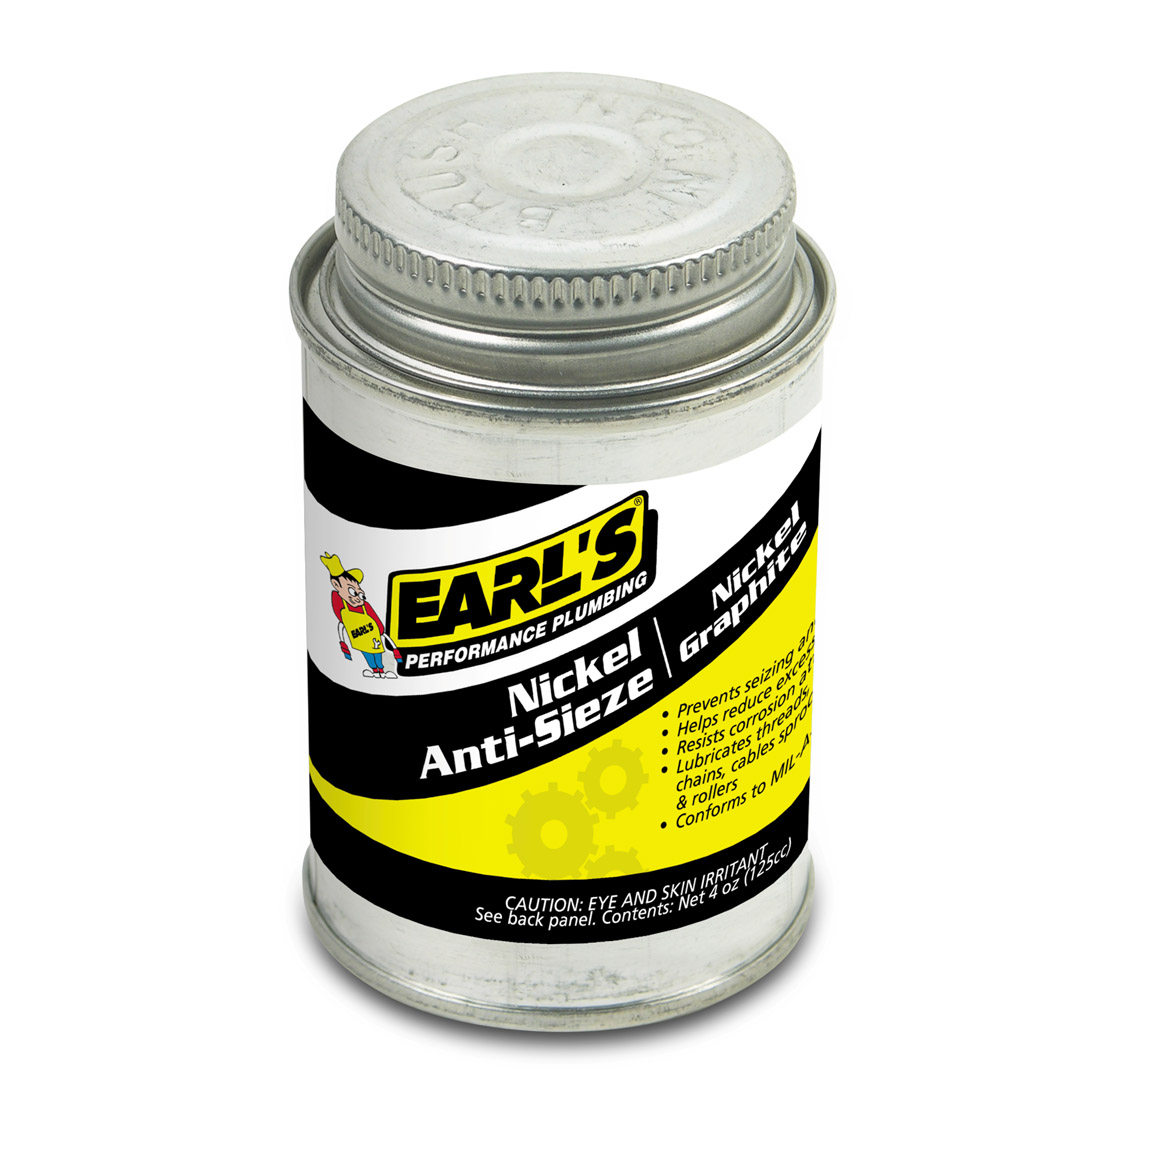 Earls Nickel Graphite Anti-Seize